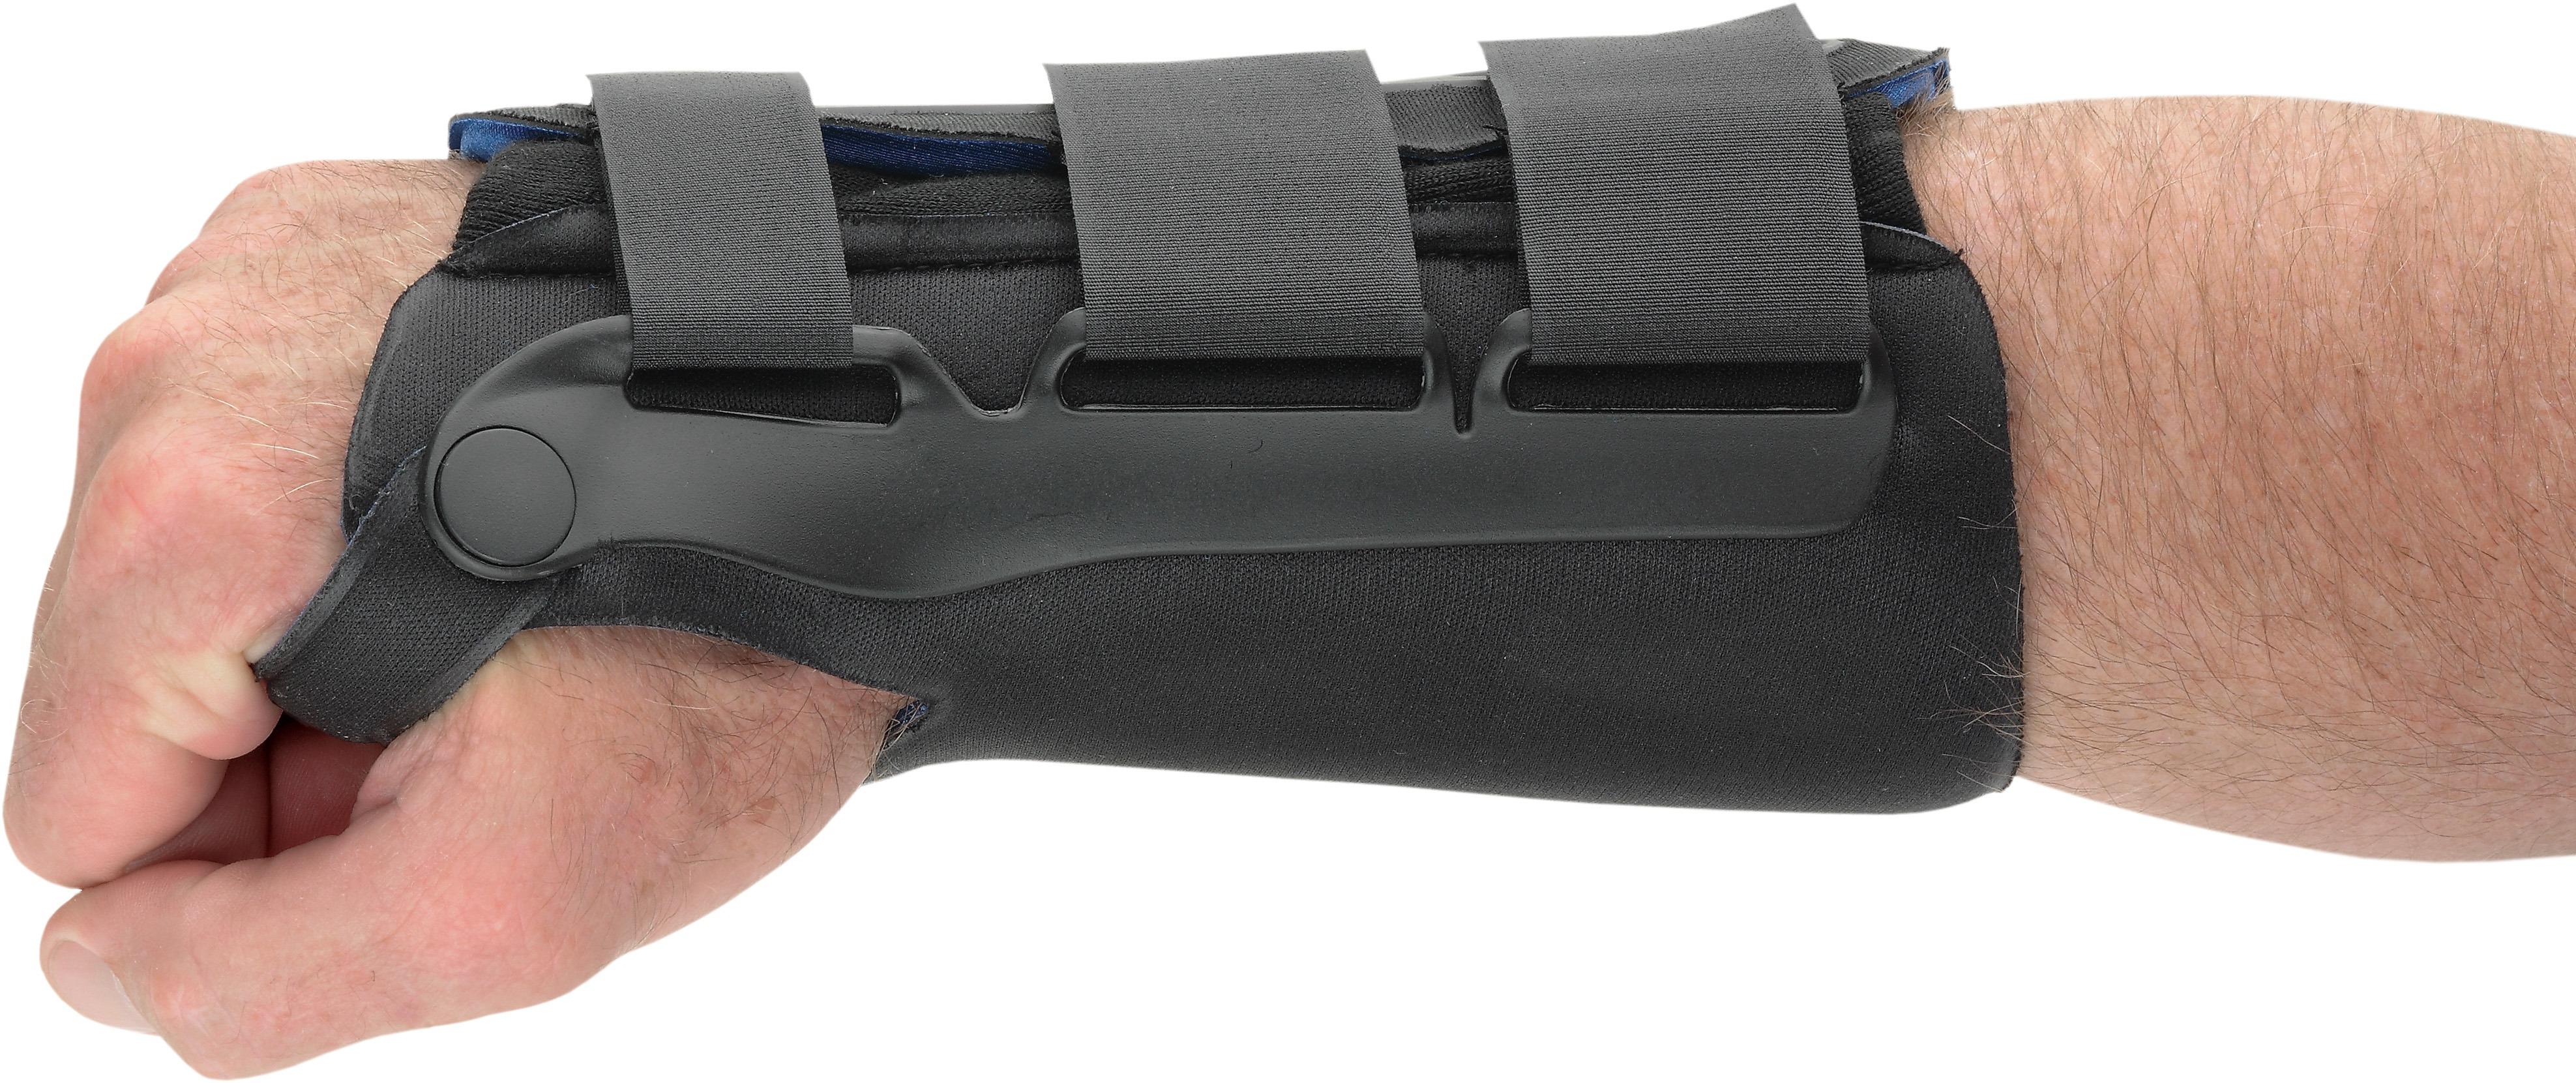 9f76b555d3 Ossur Exoform Wrist Brace - Australian Physiotherapy Equipment